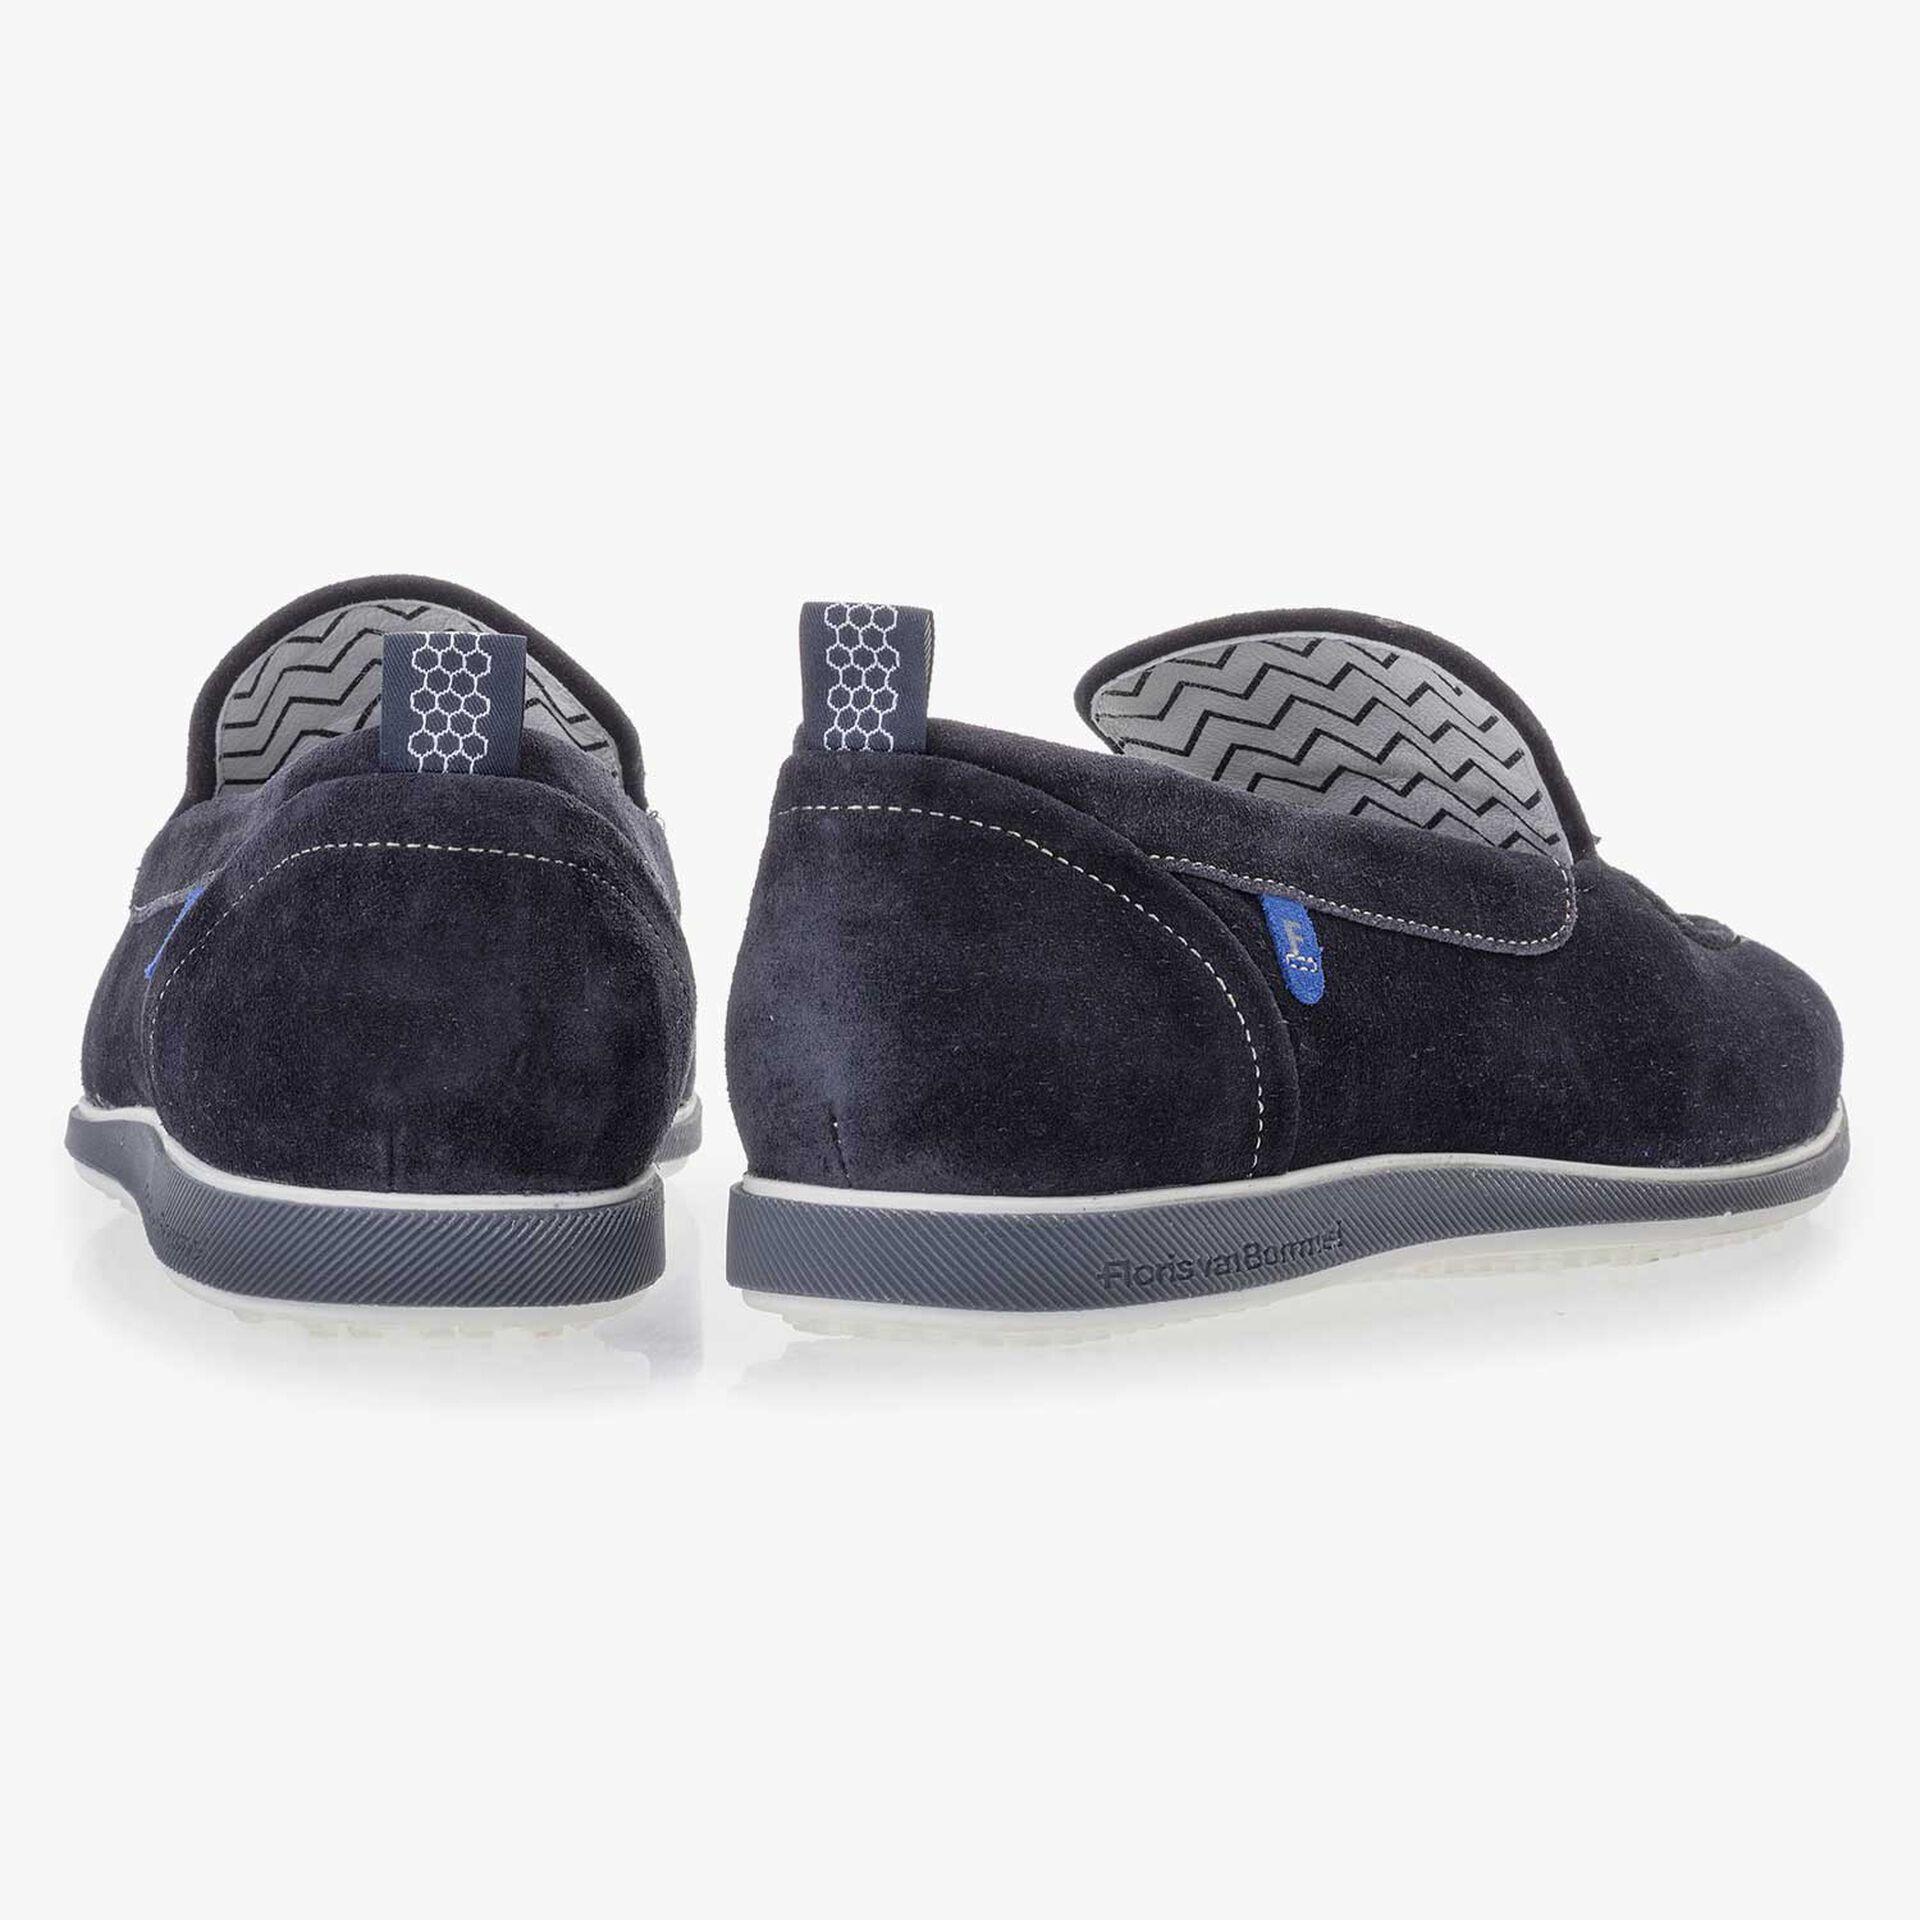 Donkerblauwe suède loafer